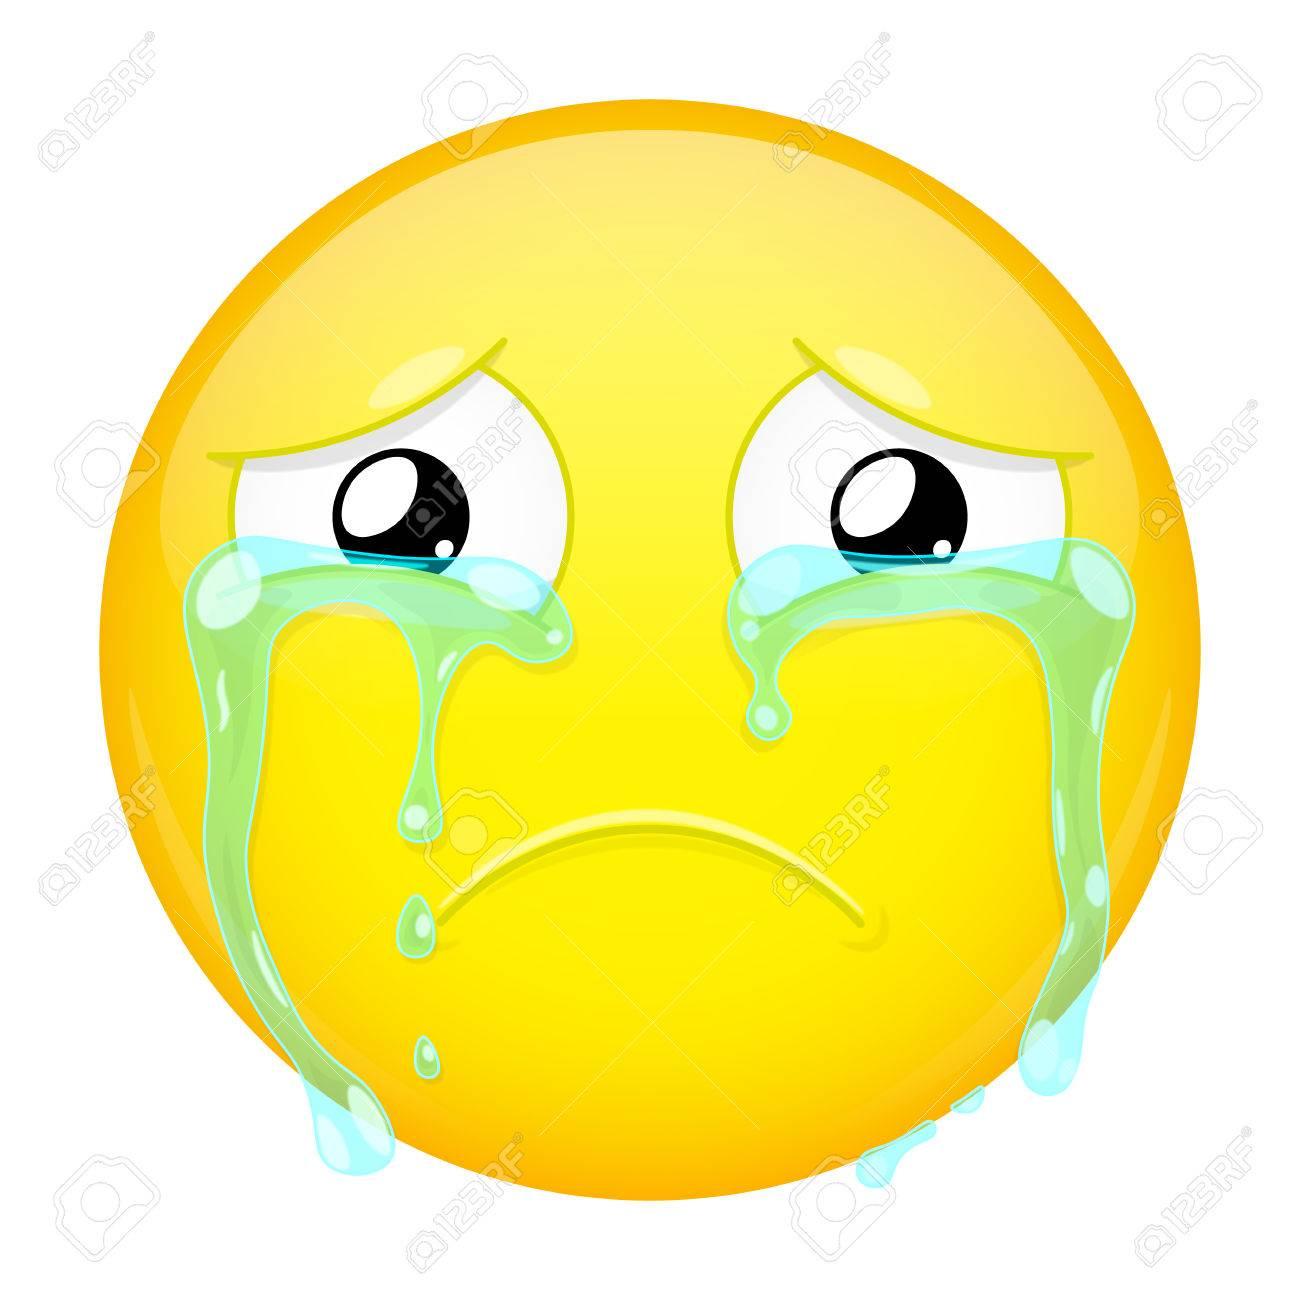 Sad Crying Emoji Bad Emotion Weeping Emoticon Vector Illustration Smile Icon Stock